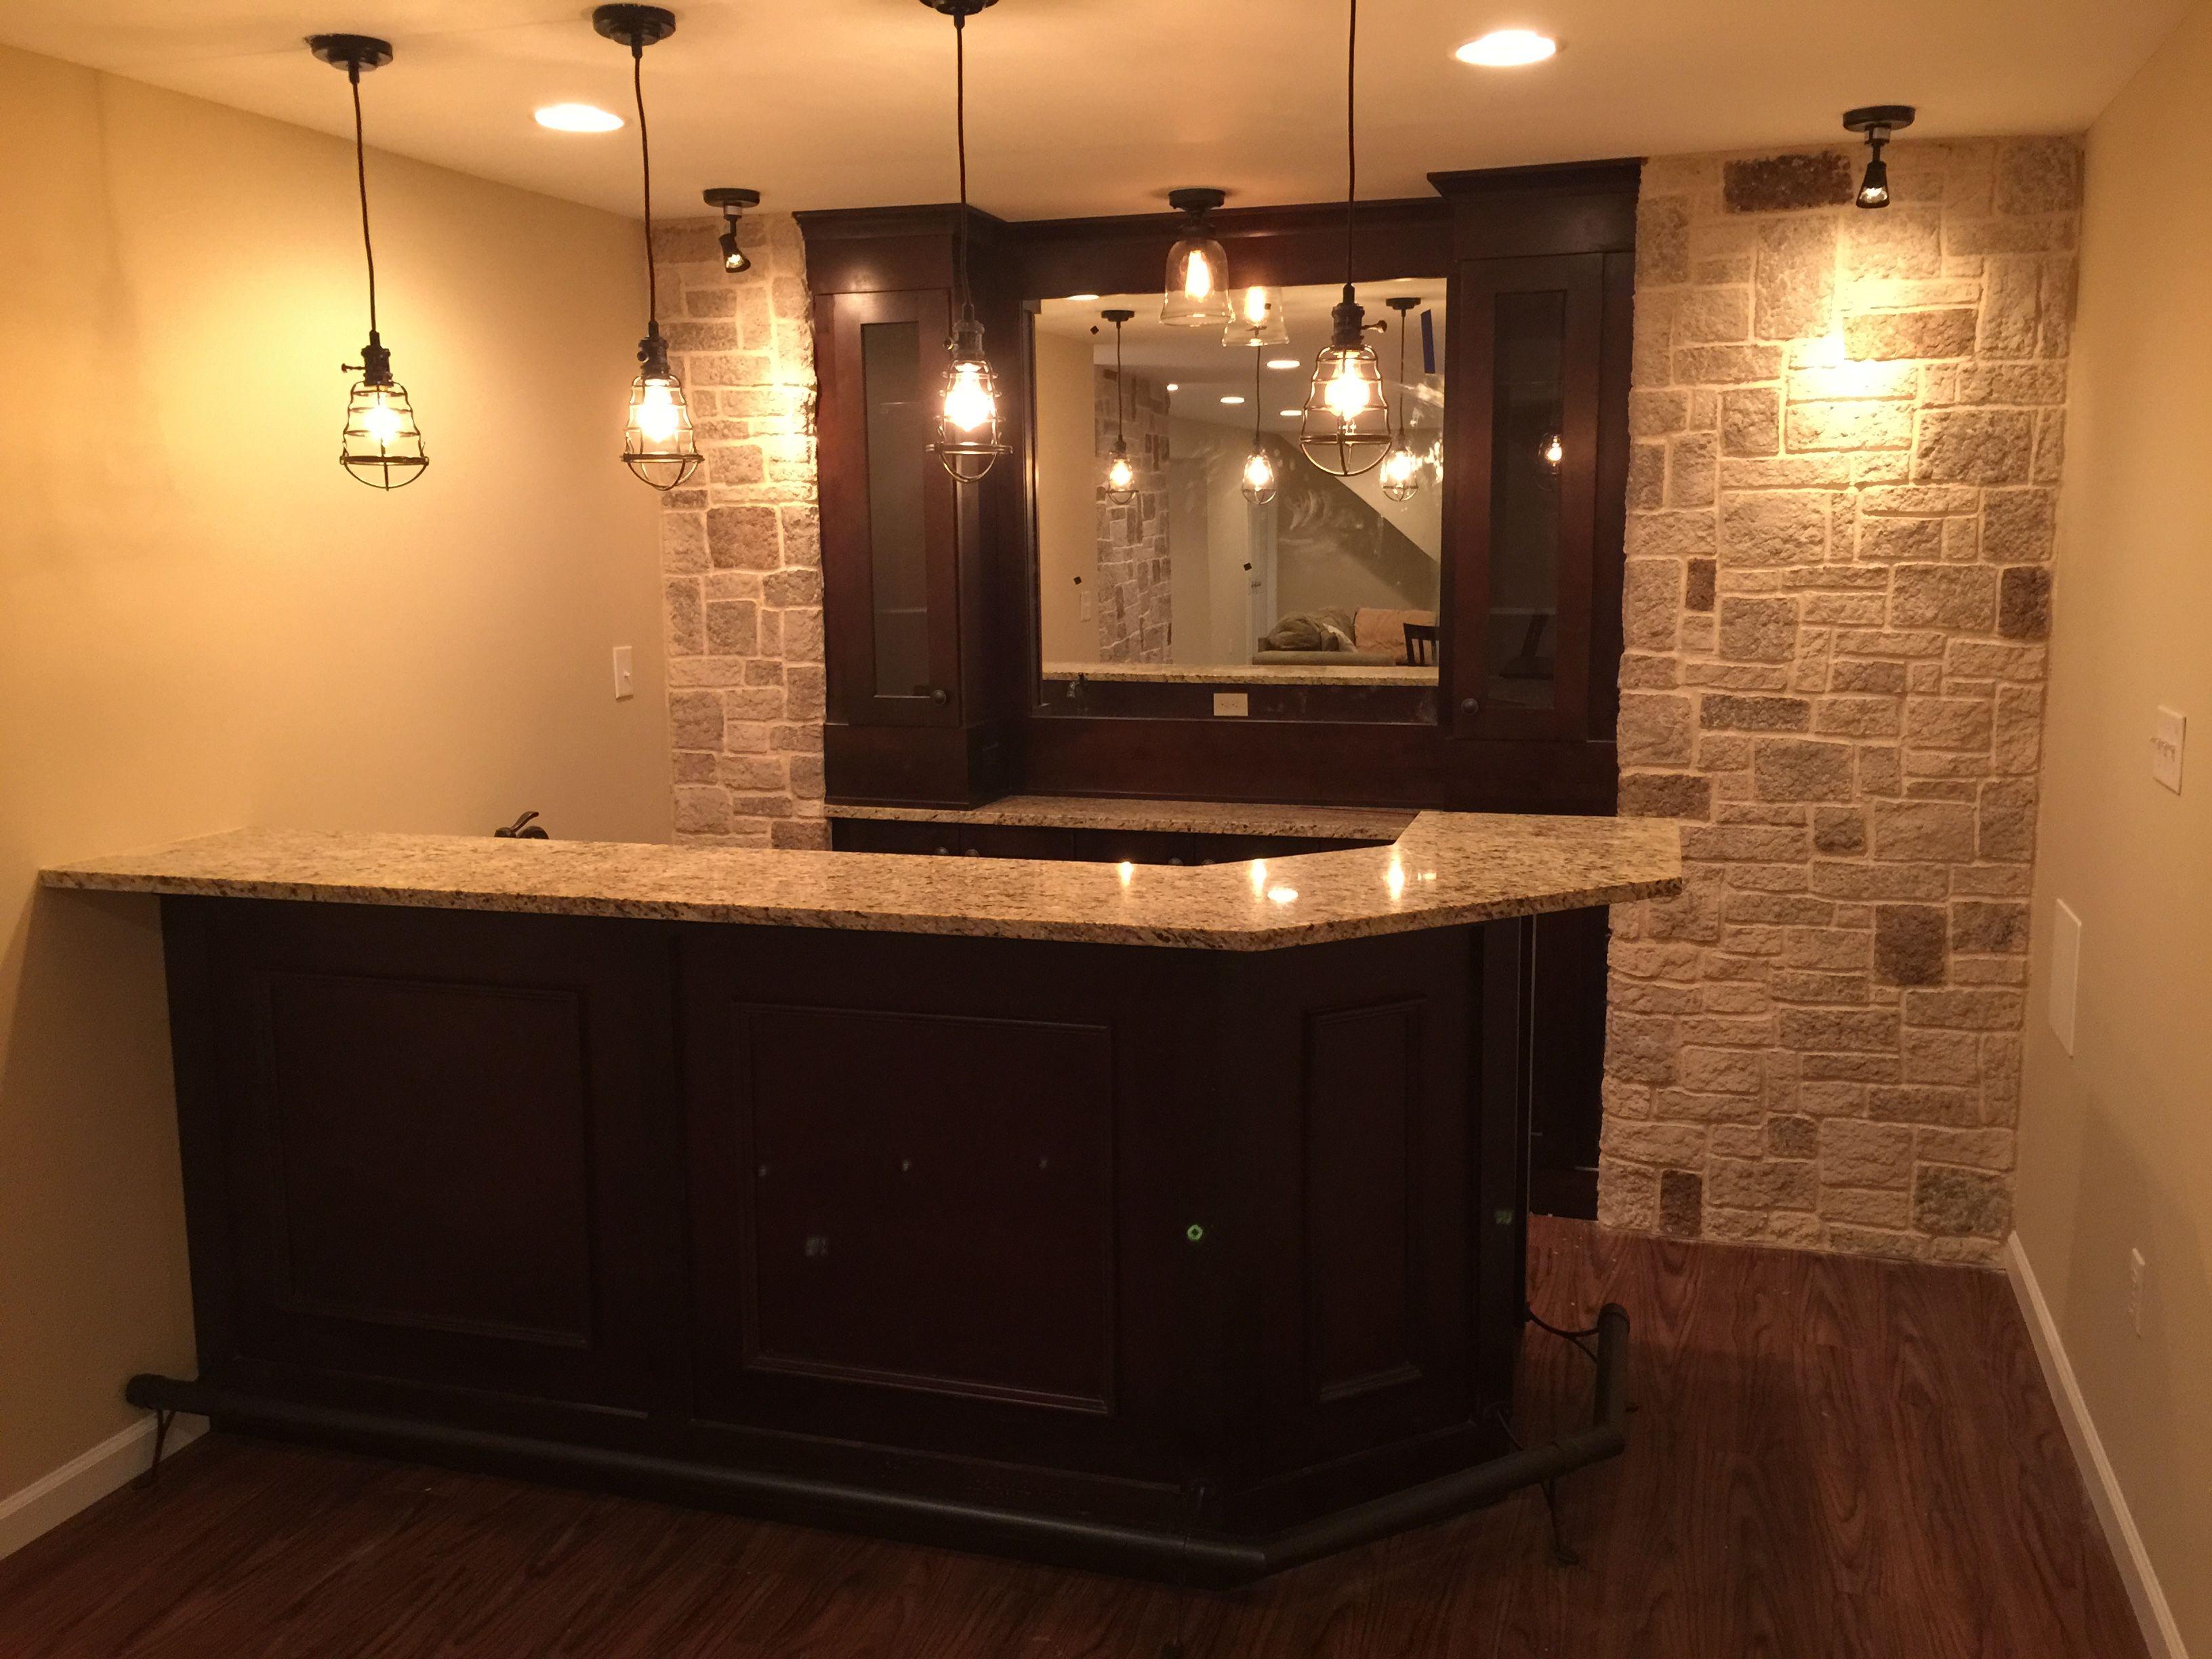 Stone Coat, Remodeling, Basement Waterproofing, Foundation Crack Repair,  Mold Remediation, Egress